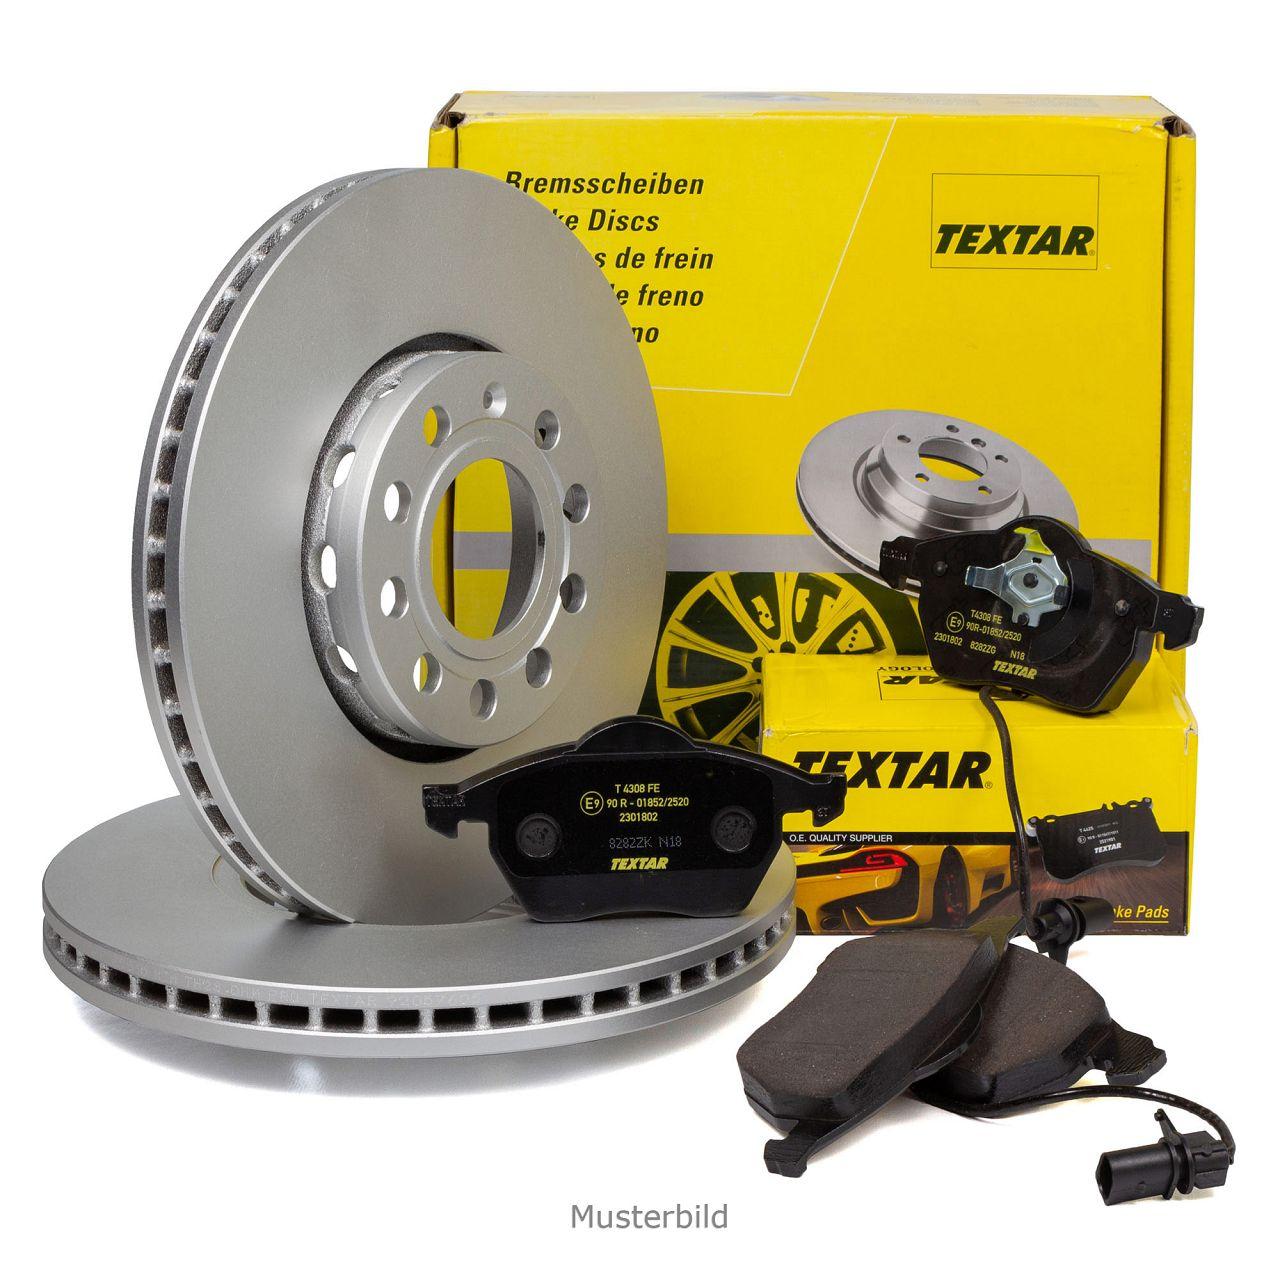 TEXTAR Bremsscheiben Beläge Wako AUDI A4 B6 B7 A6 C5 VW Passat 3B 2.8 vorne